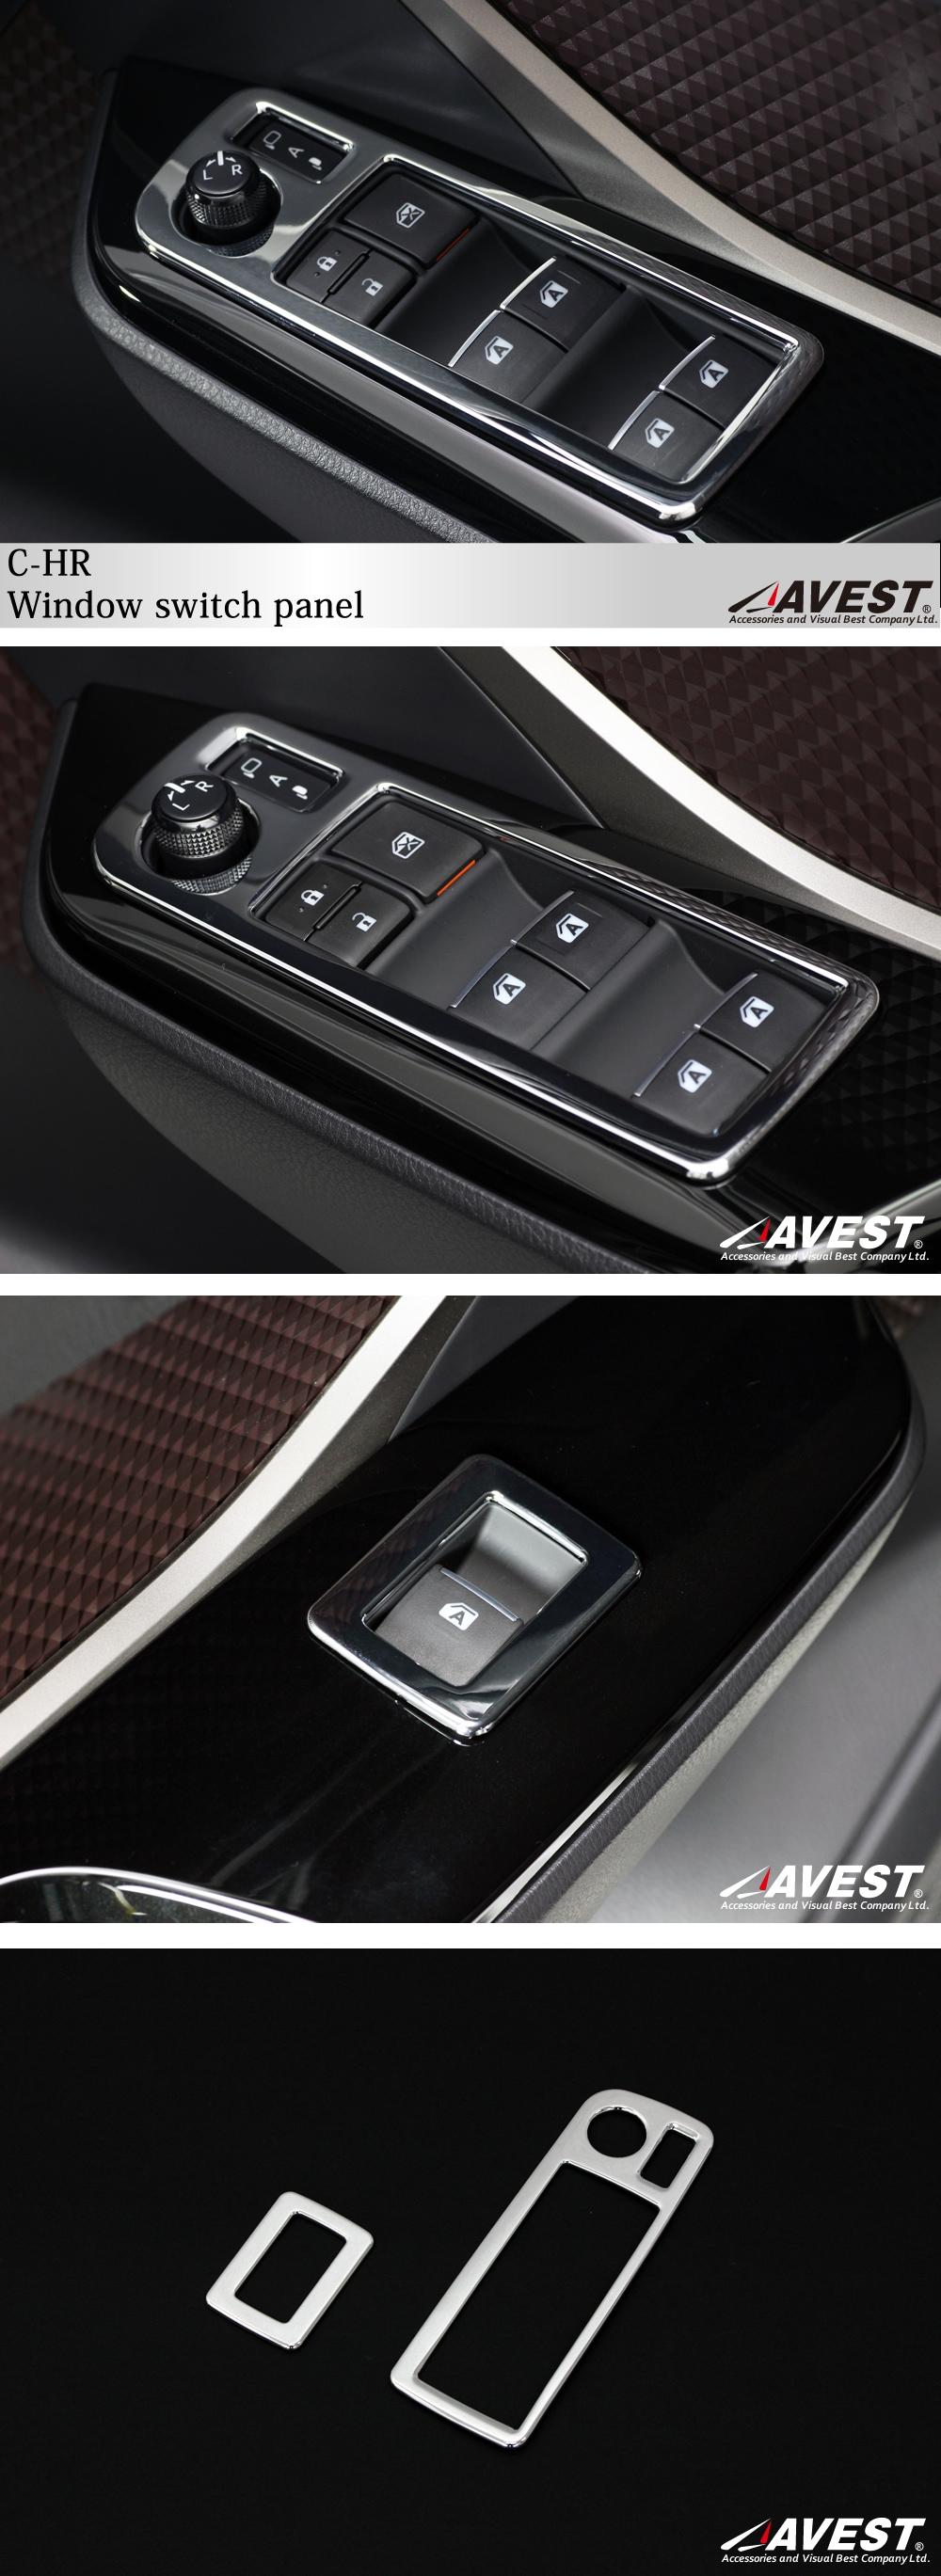 TOYOTA C-HR NGX50 ZYX10 ウィンドウ スイッチ パネル / トヨタ CHR 内装 メッキ ガーニッシュ パーツ